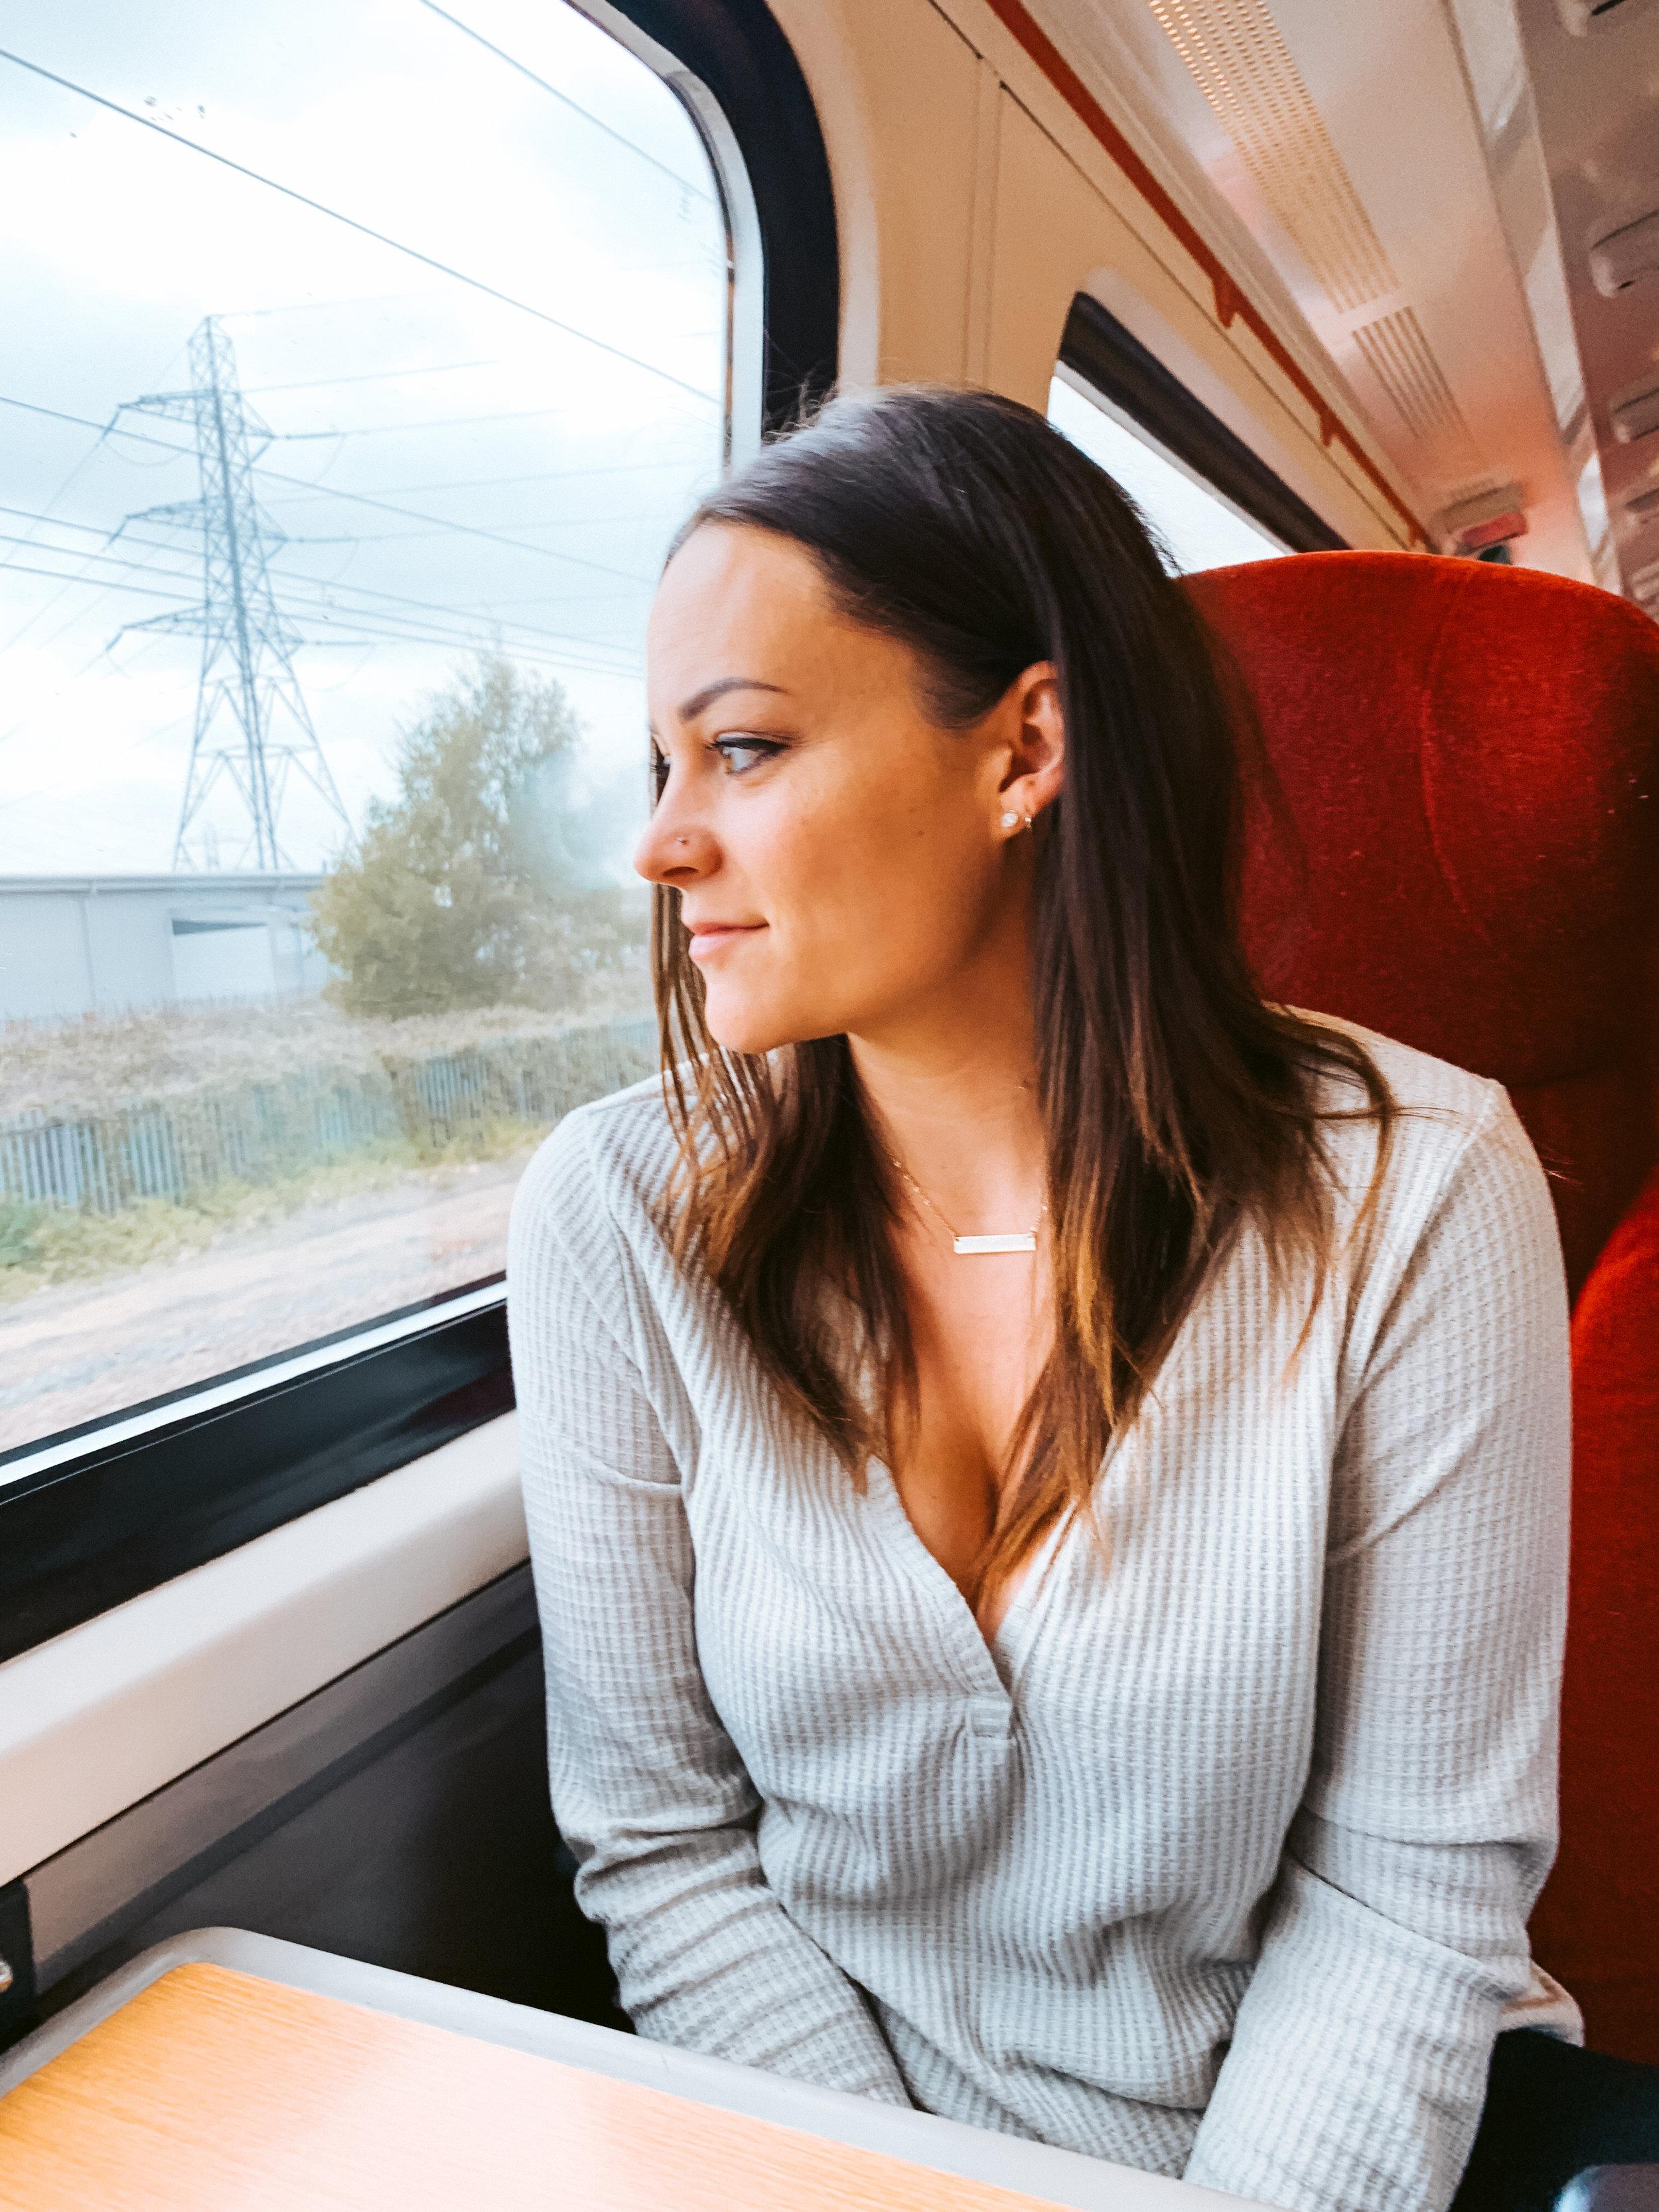 Laura on LNER Train Leaving Scotland